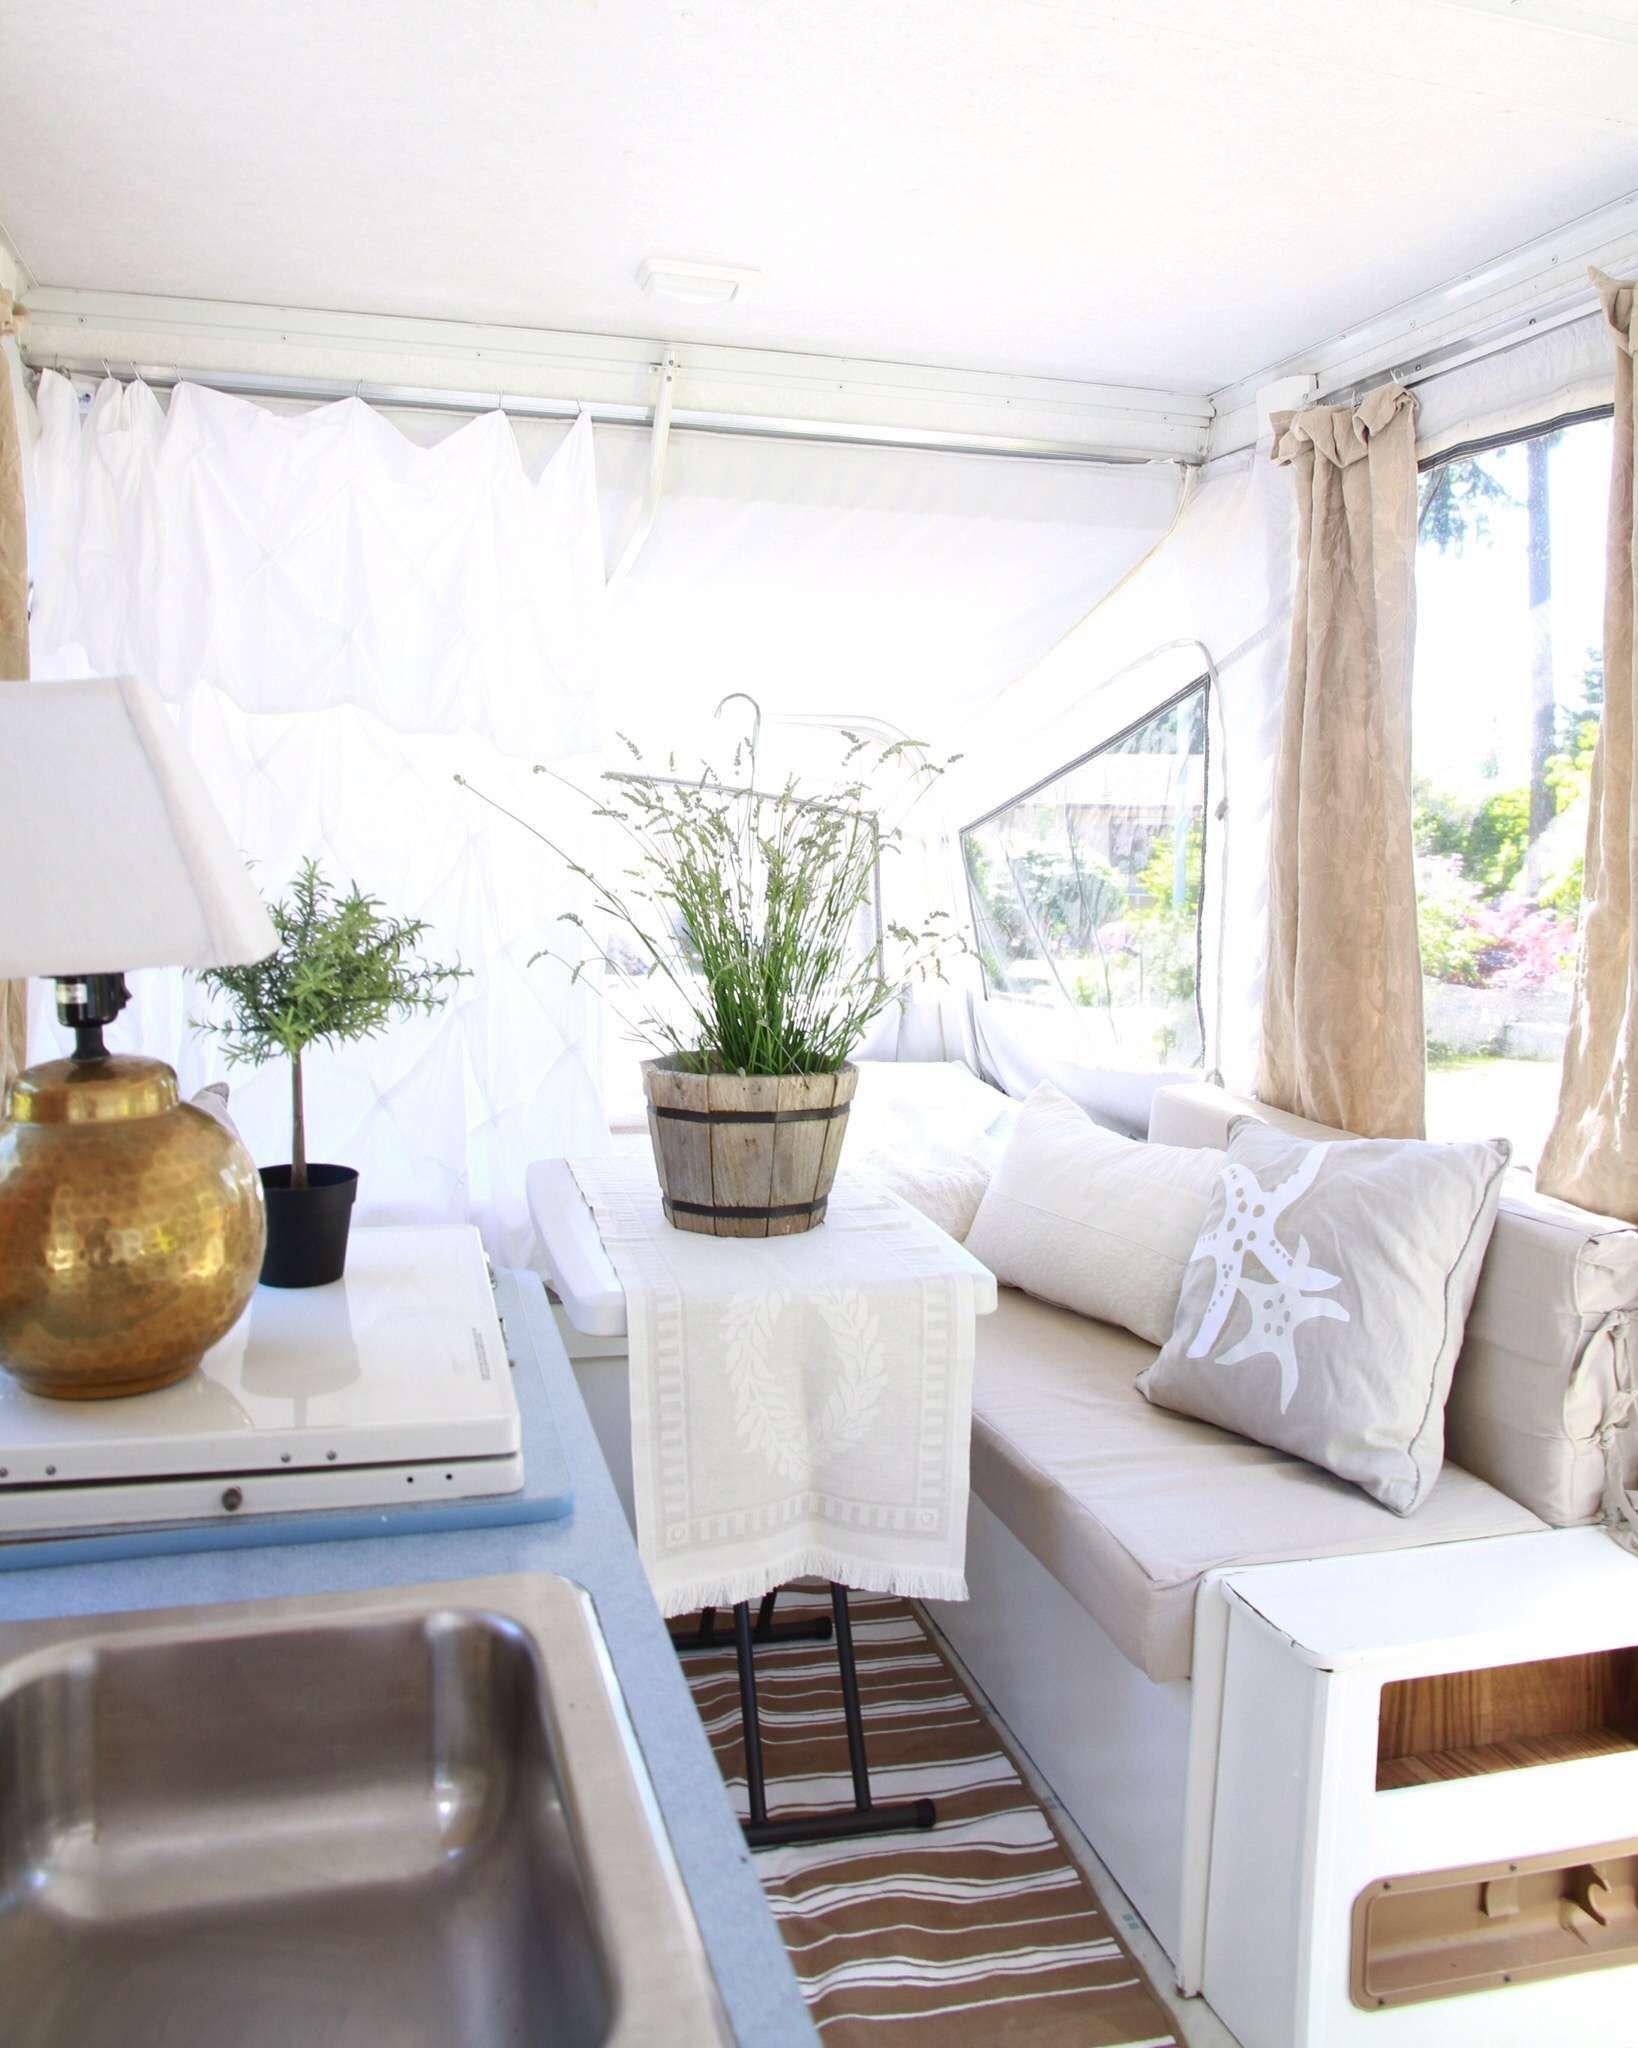 Majestic 80+ Best RV Interior Decorating For Summer Https://decoratio.co